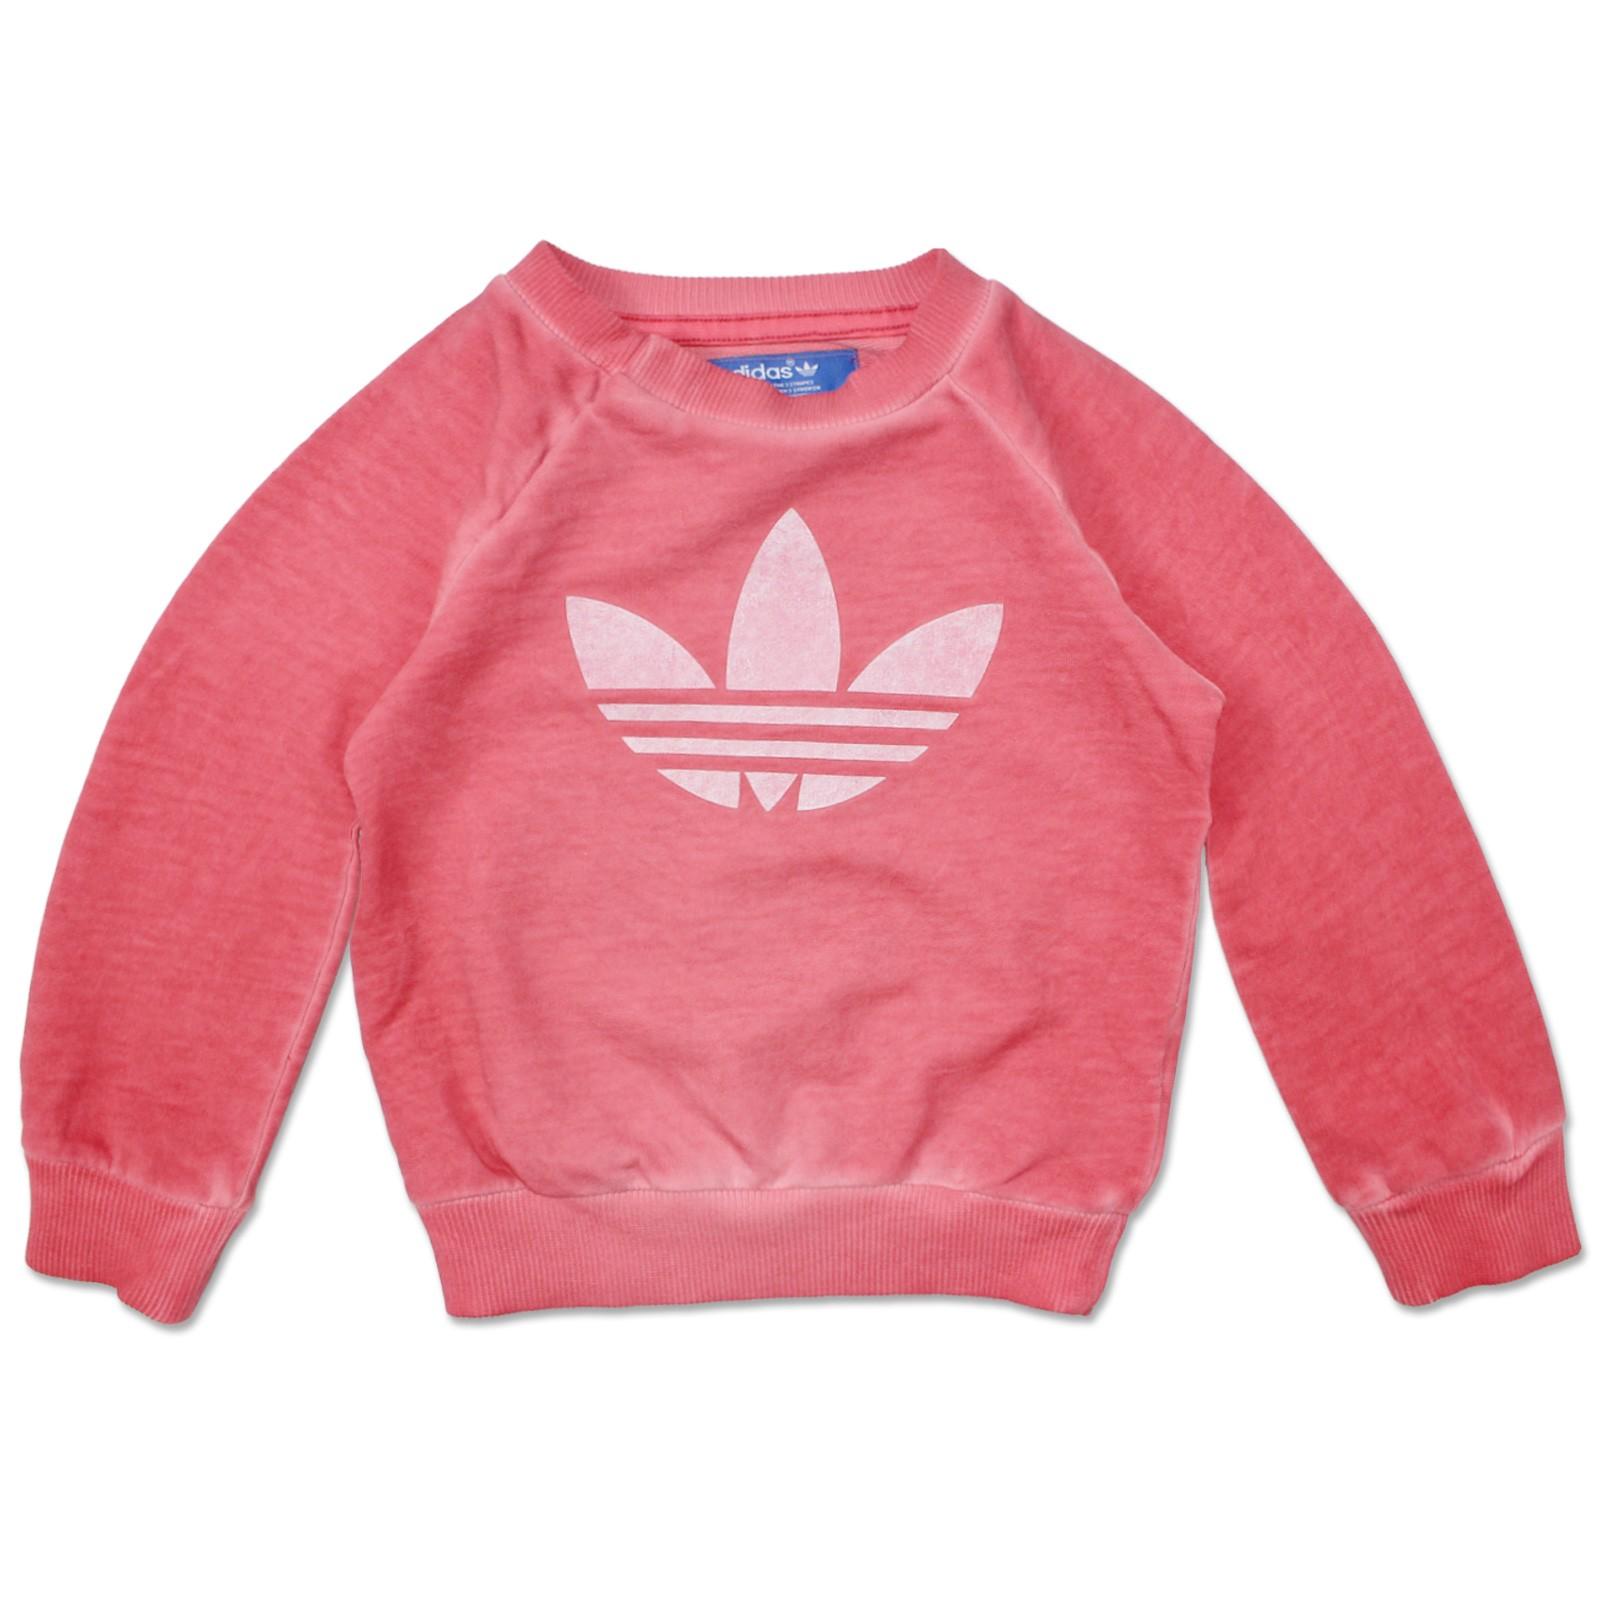 Adidas Baby Anzug Rosa